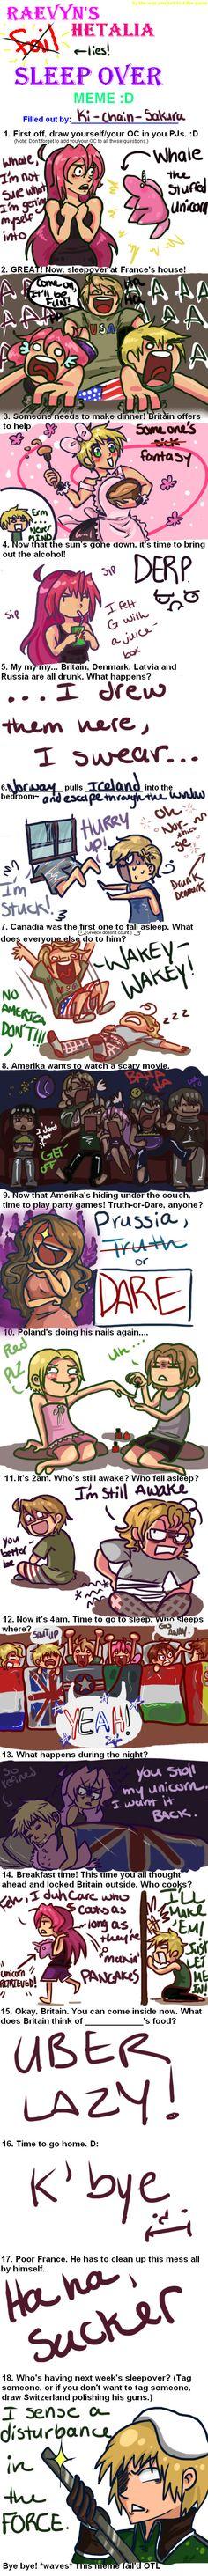 Hetalia Sleepover Meme by Ki-chain-Sakura on deviantART